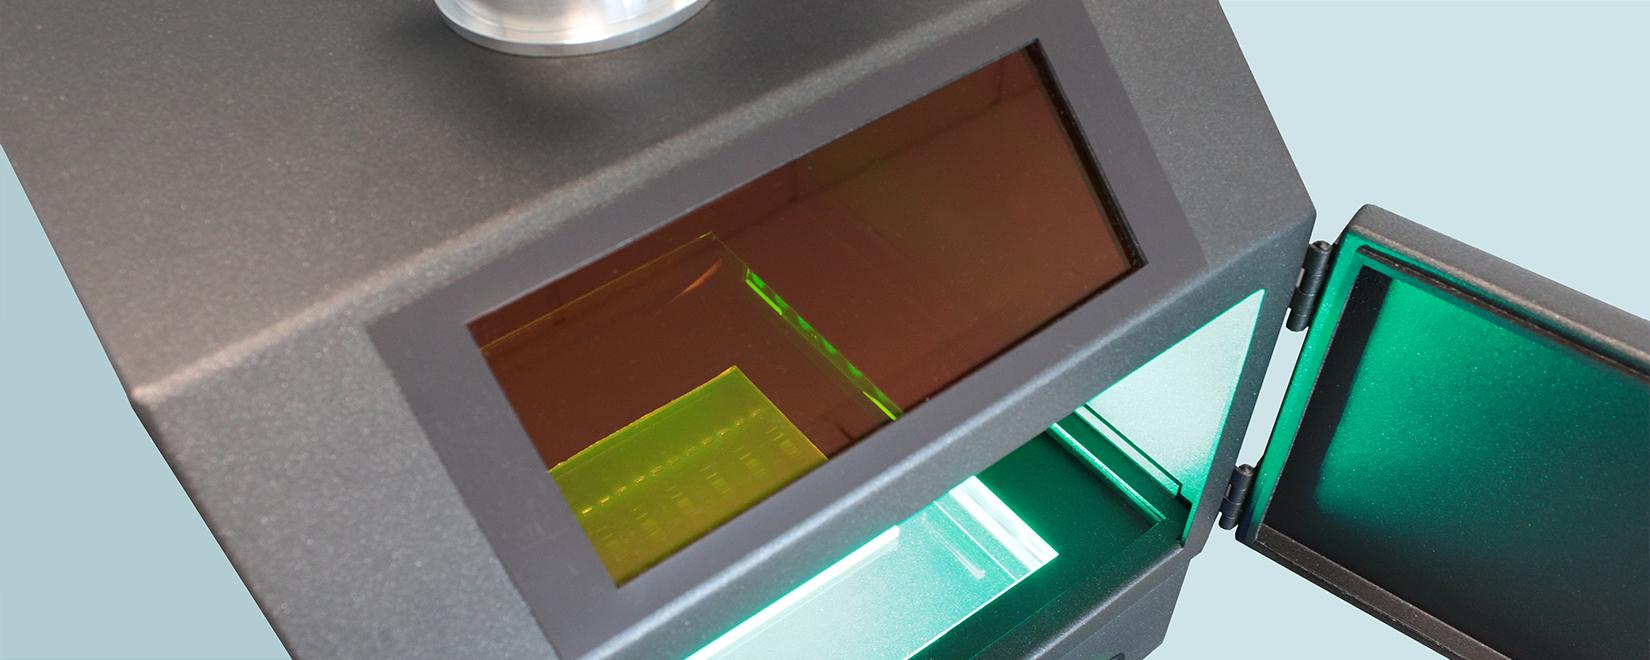 FastGene FAS-DIGI-Compact viewing windoww-gel